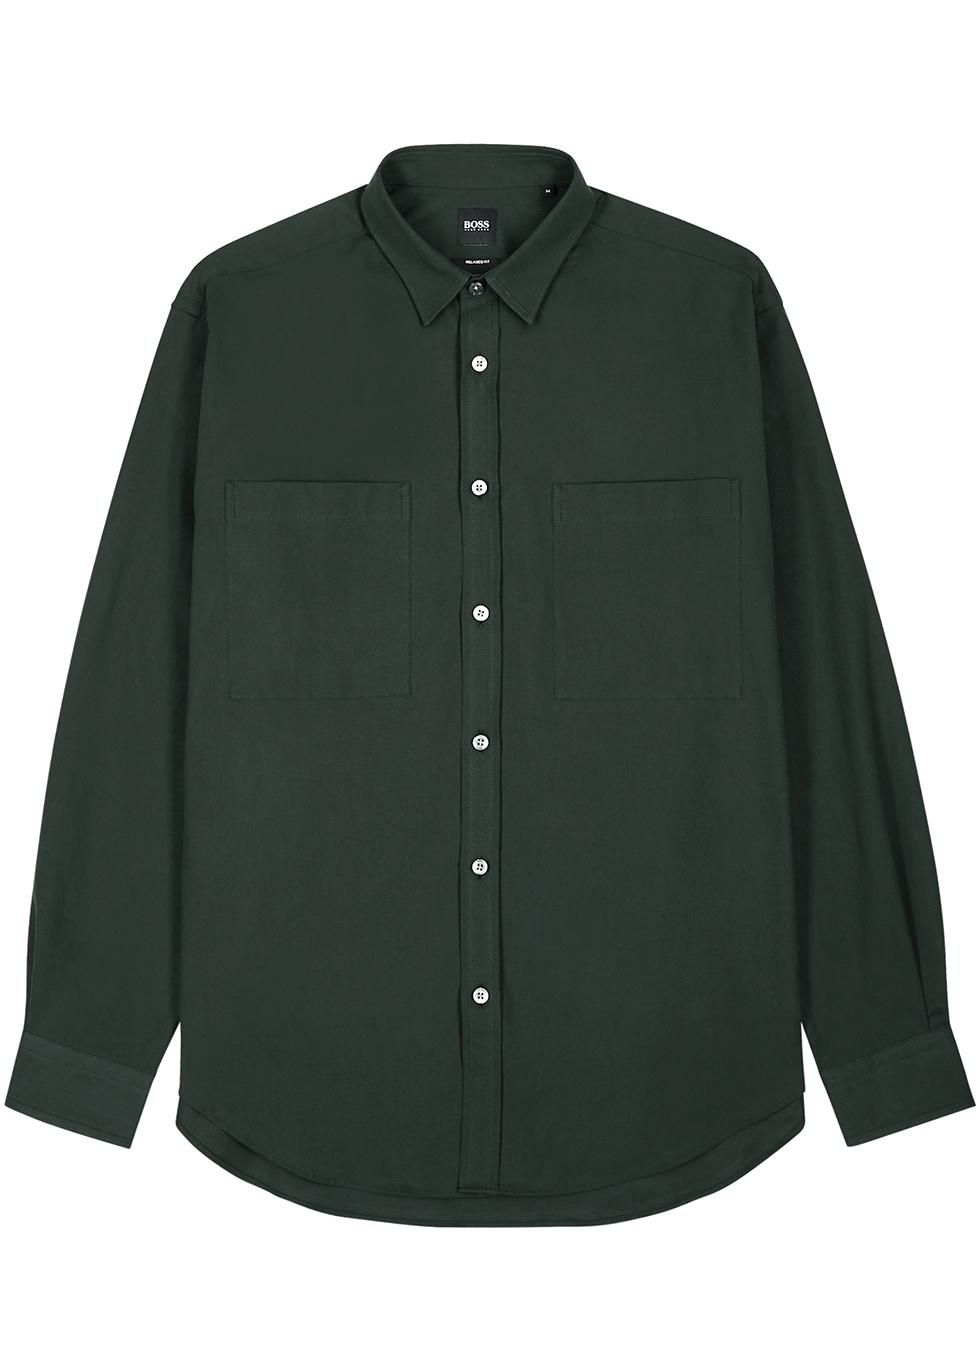 Dark green cotton shirt